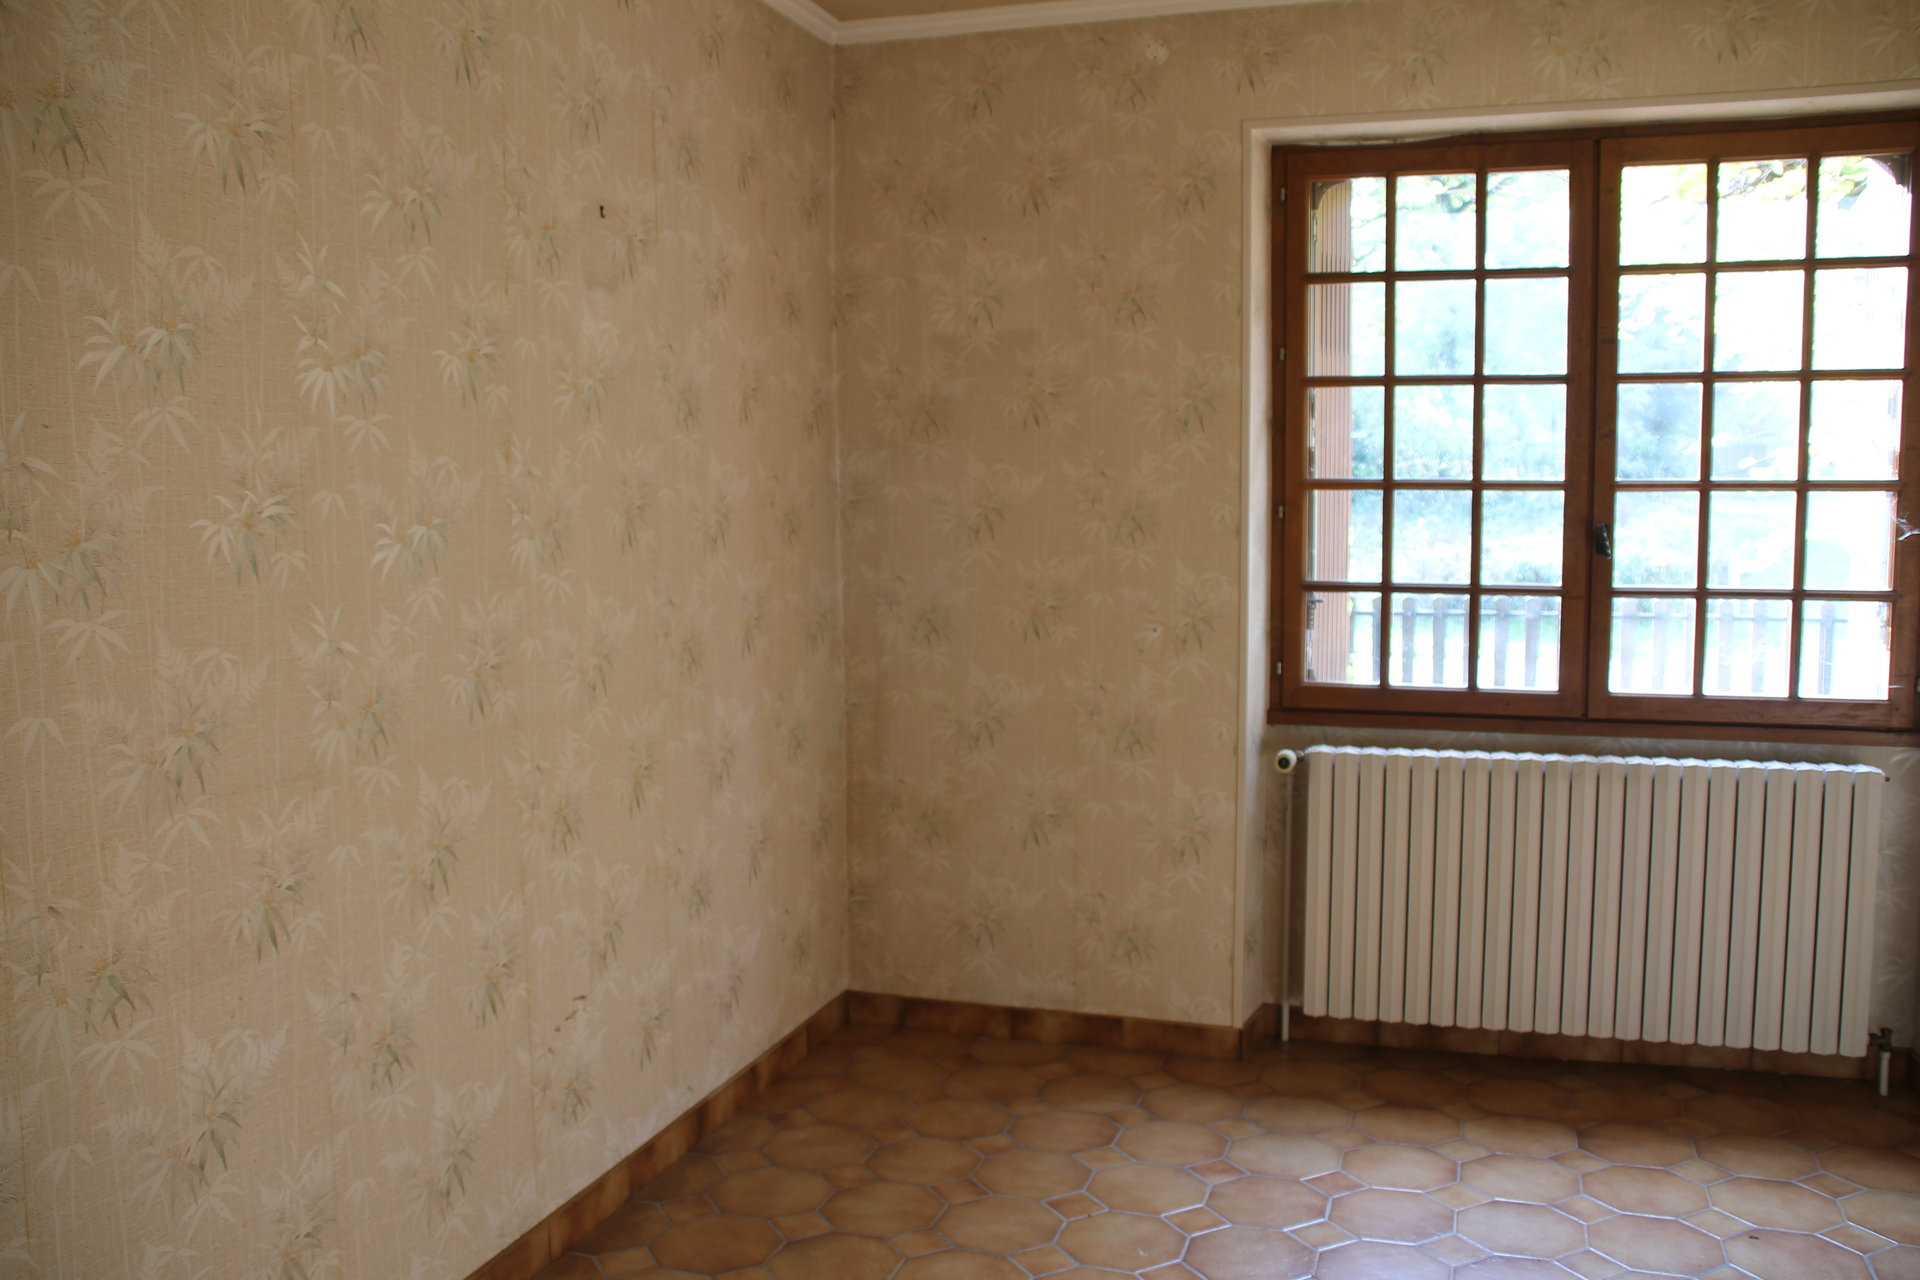 PERREUIL - Ensemble immobilier